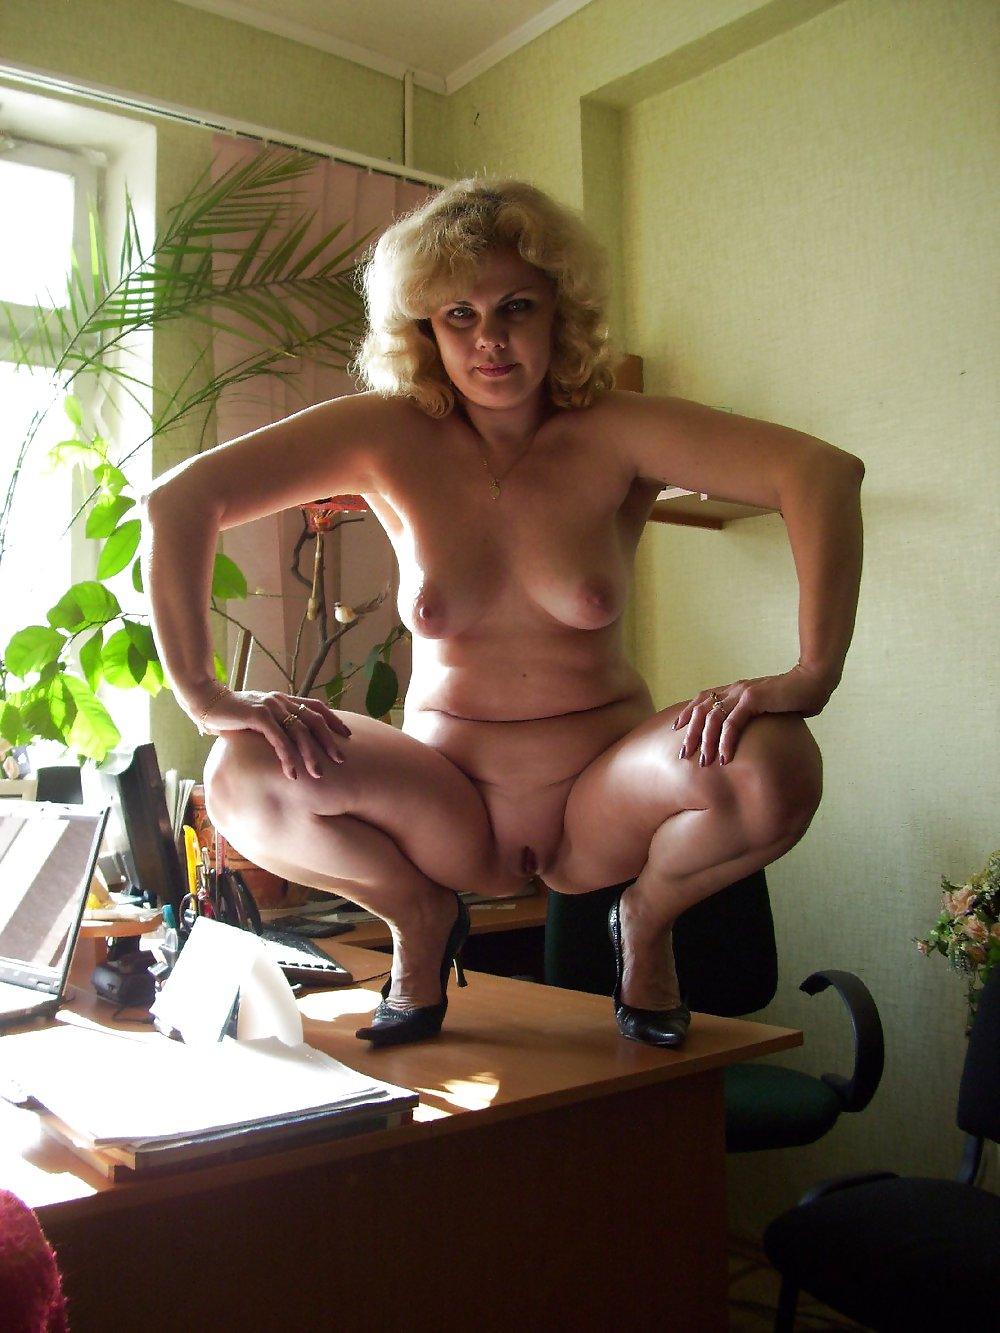 zrelaya-buhgaltersha-porno